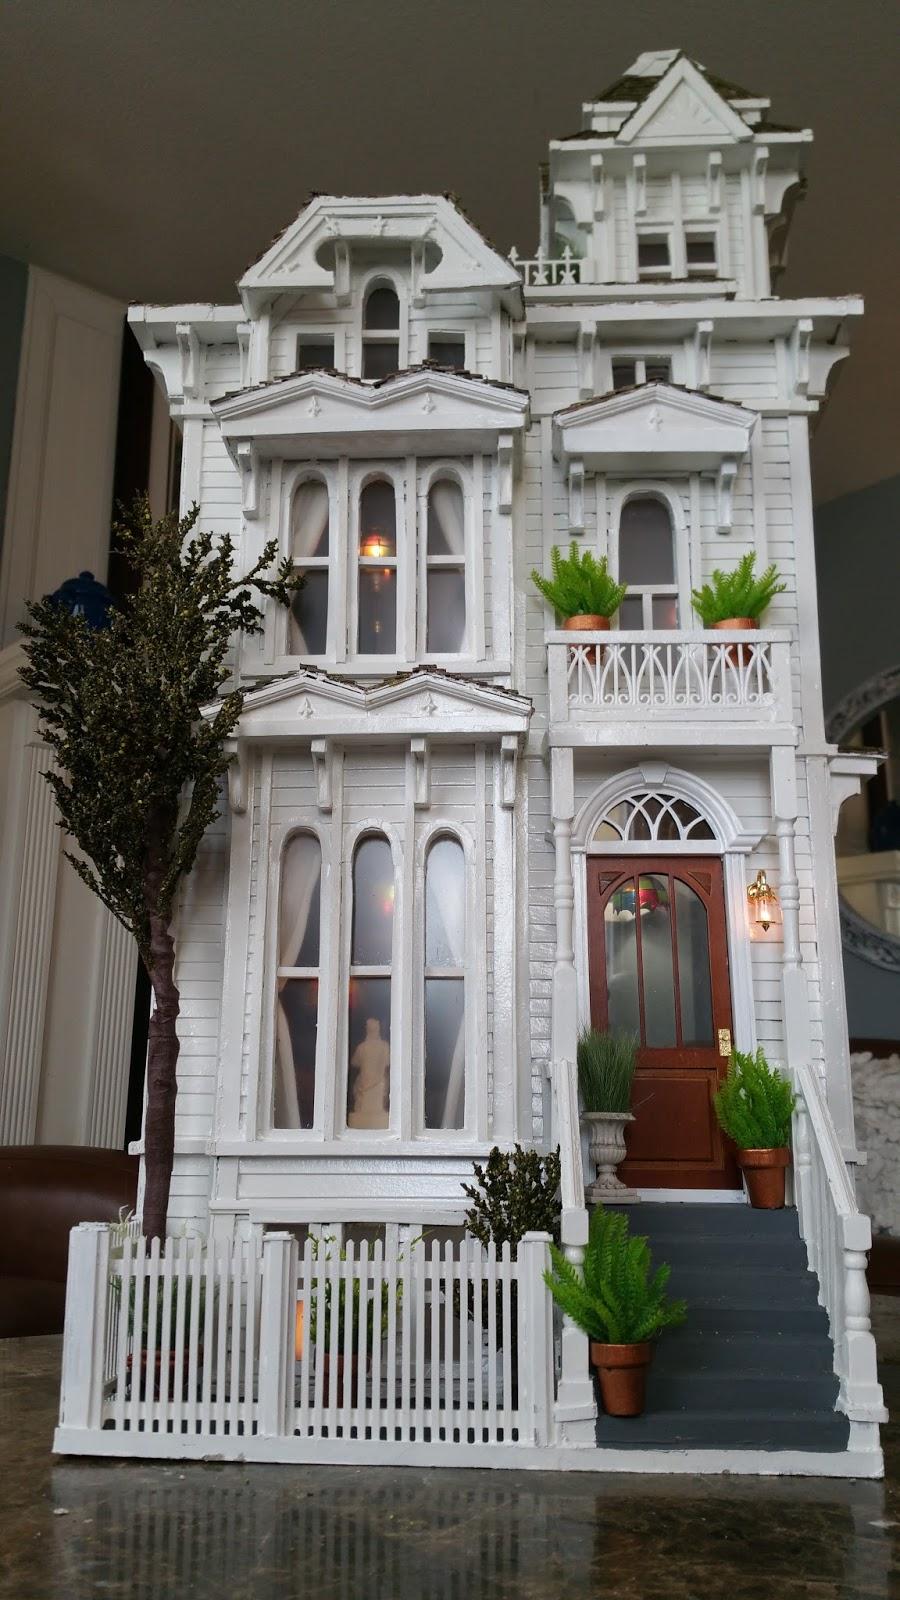 greggs miniature imaginations san fransisco house made. Black Bedroom Furniture Sets. Home Design Ideas